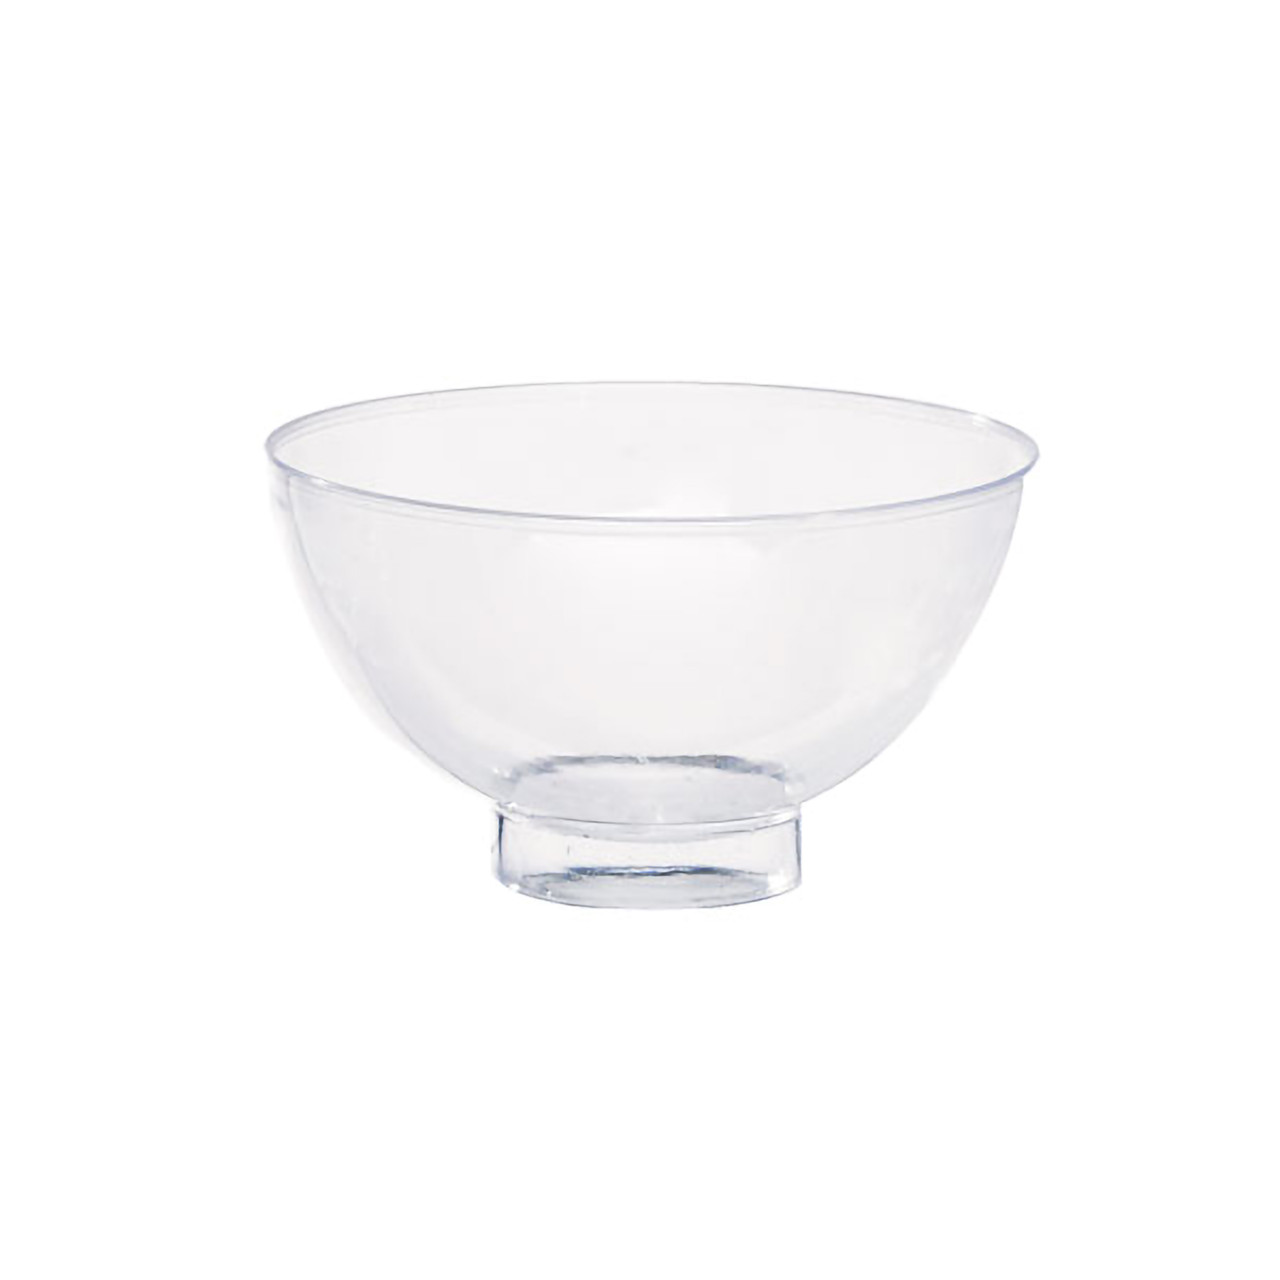 Milou Round Mini Bowl -2oz Dia:2.6in H:1.45in